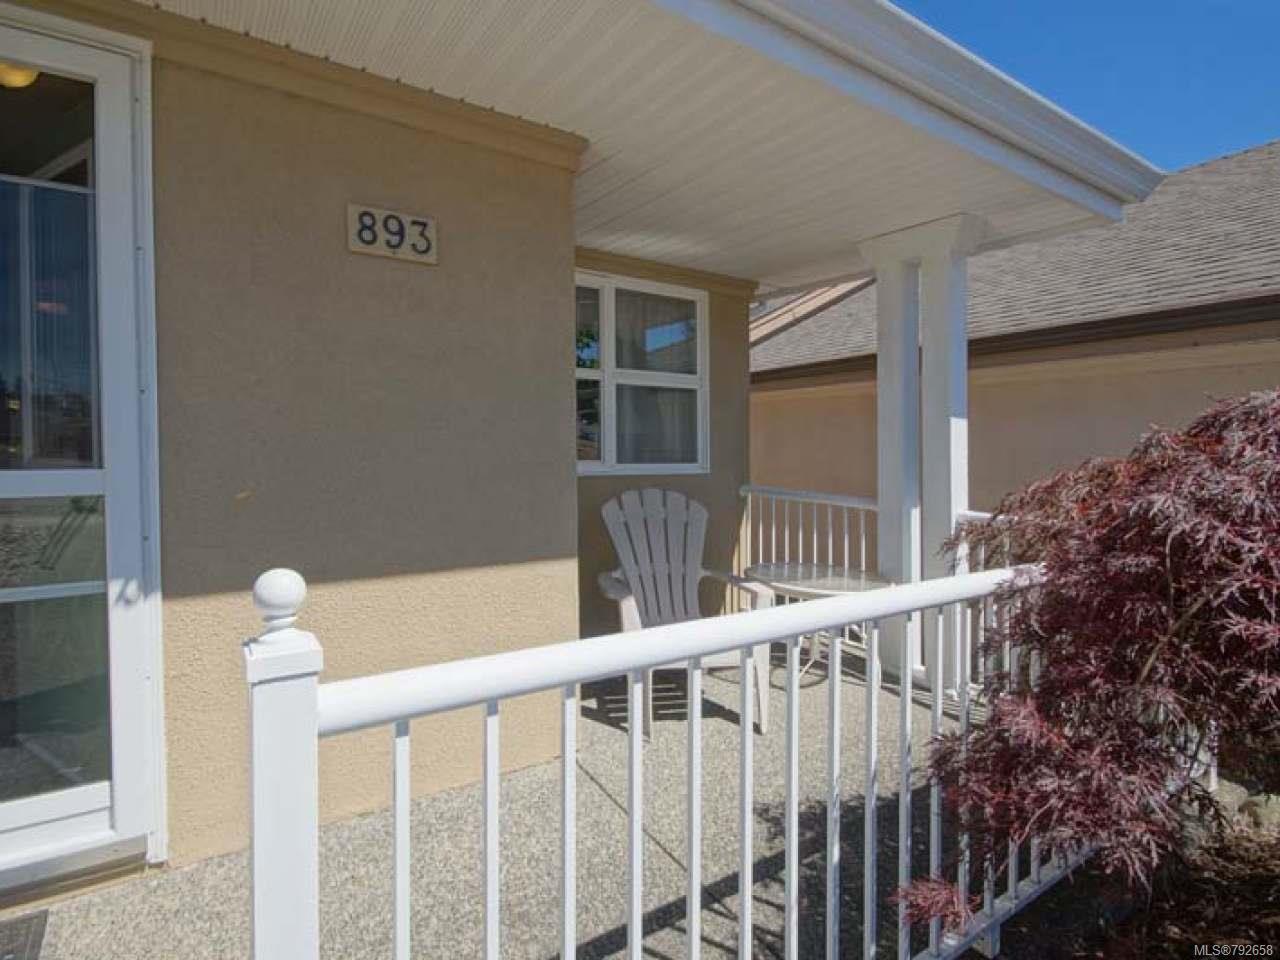 Photo 11: Photos: 893 EDGEWARE Avenue in PARKSVILLE: PQ Parksville House for sale (Parksville/Qualicum)  : MLS®# 792658